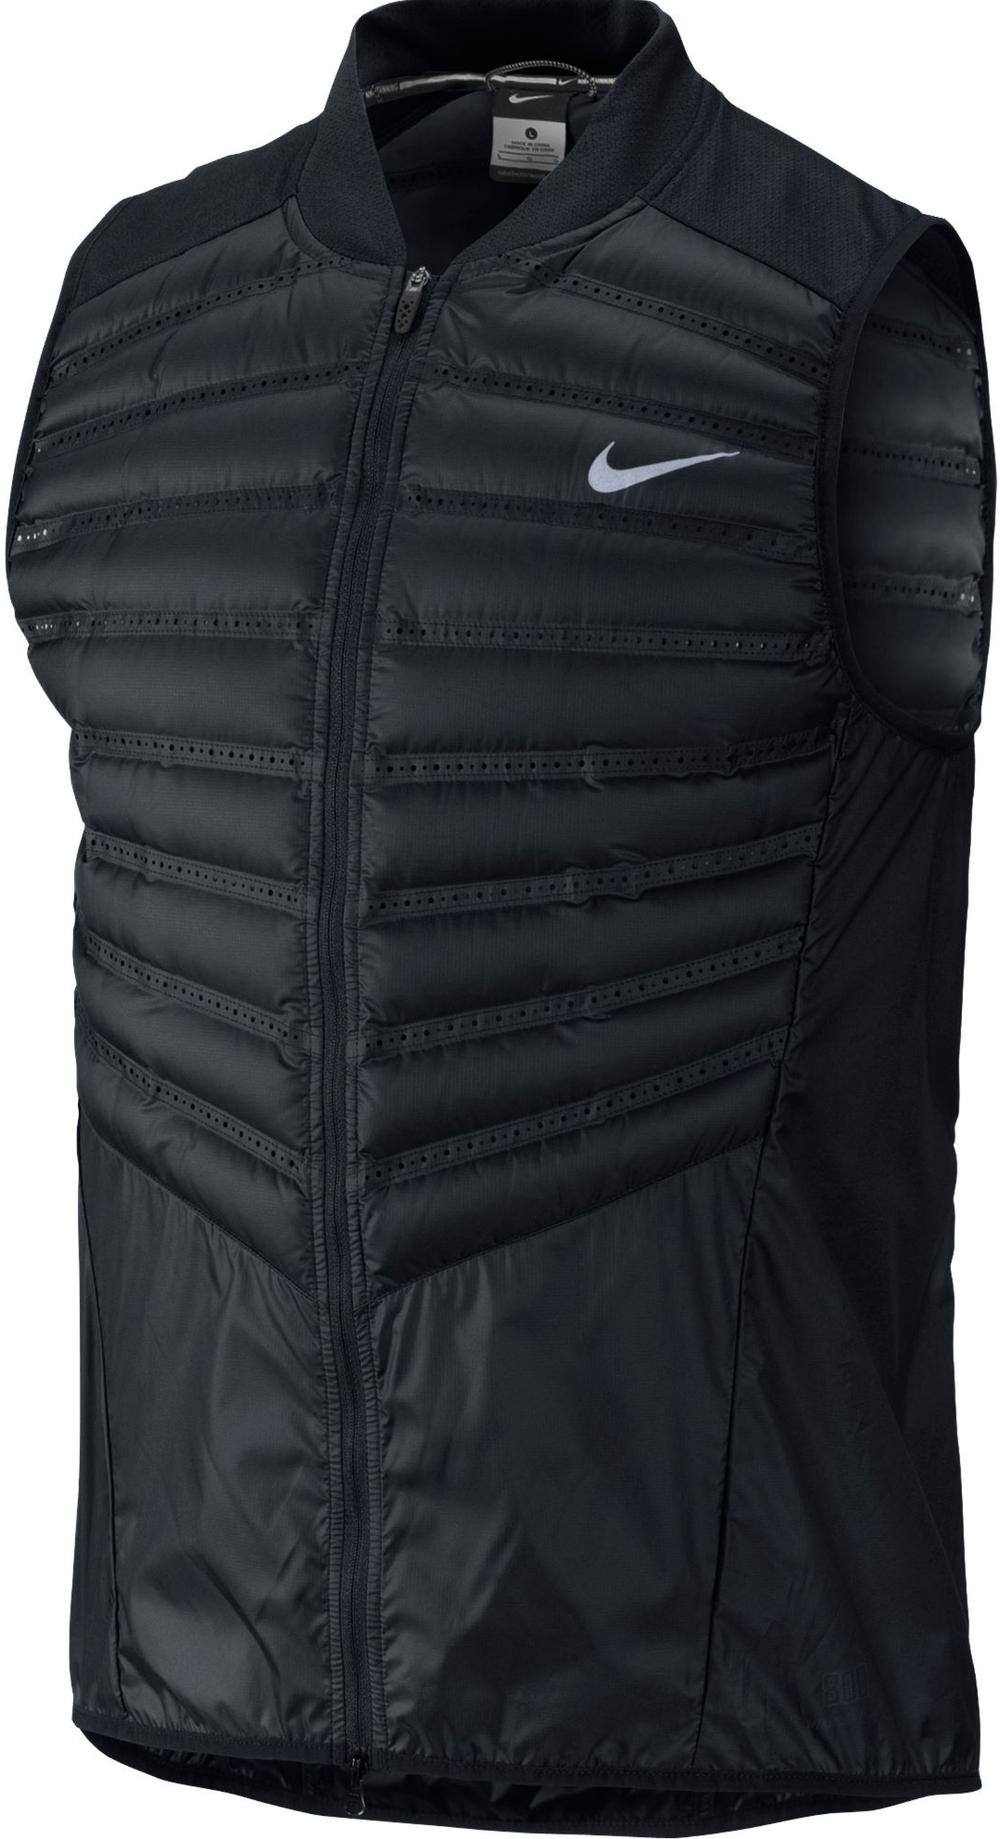 Nike Aeroloft 800 Gillet, $180